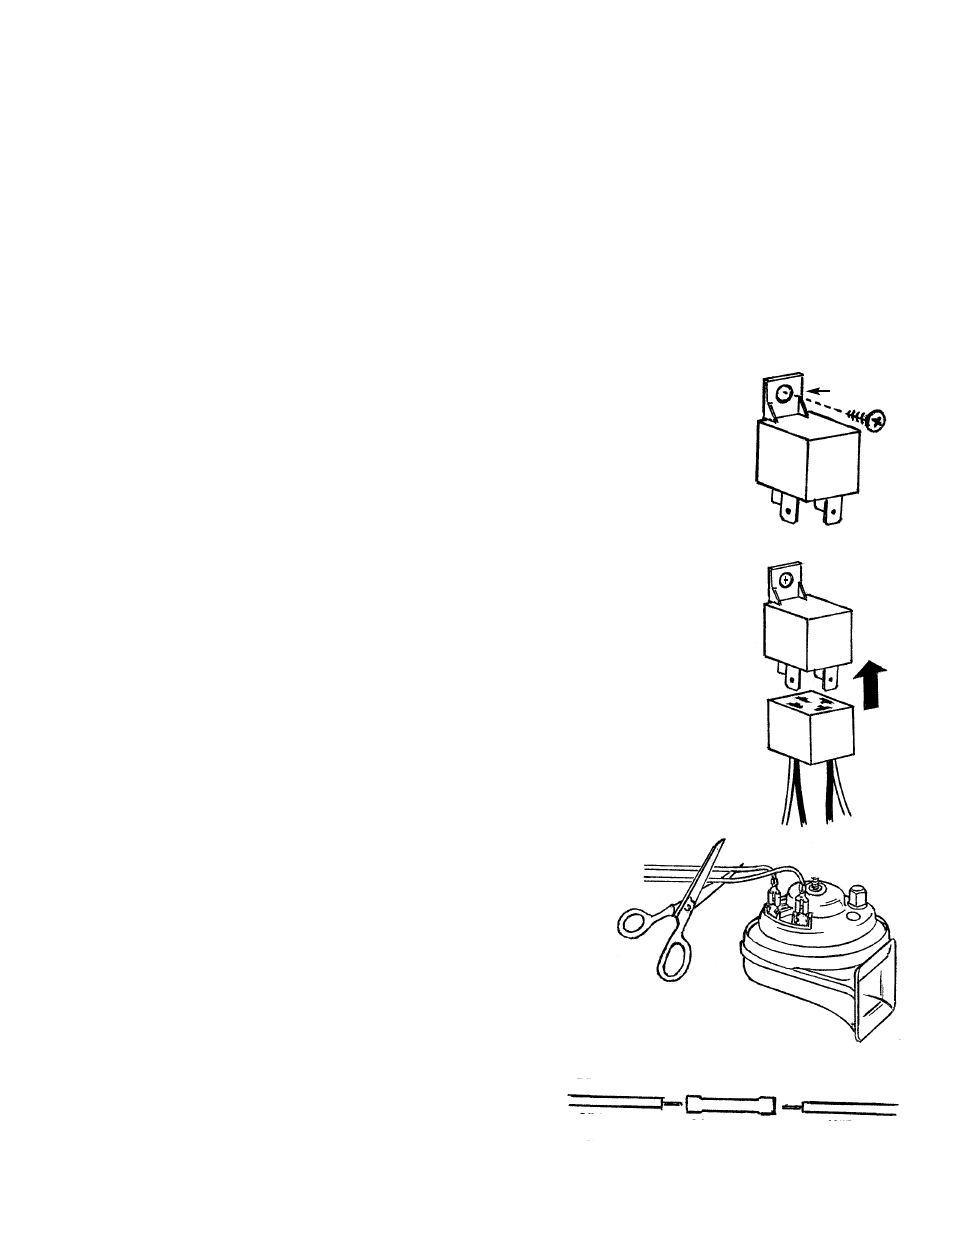 Horn Wiring Kit Wolo MCHWK-2 Air